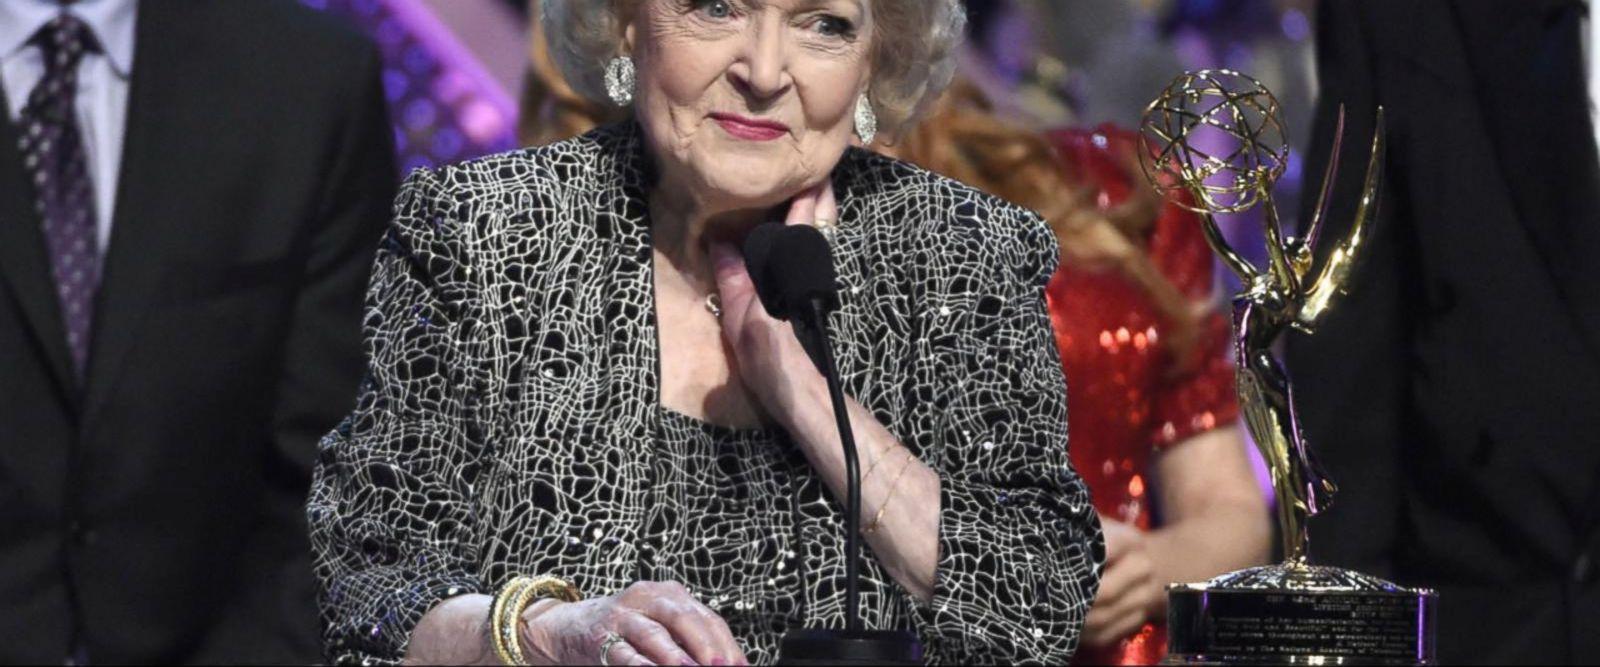 VIDEO: Happy 95th Birthday to An American Treasure, Betty White